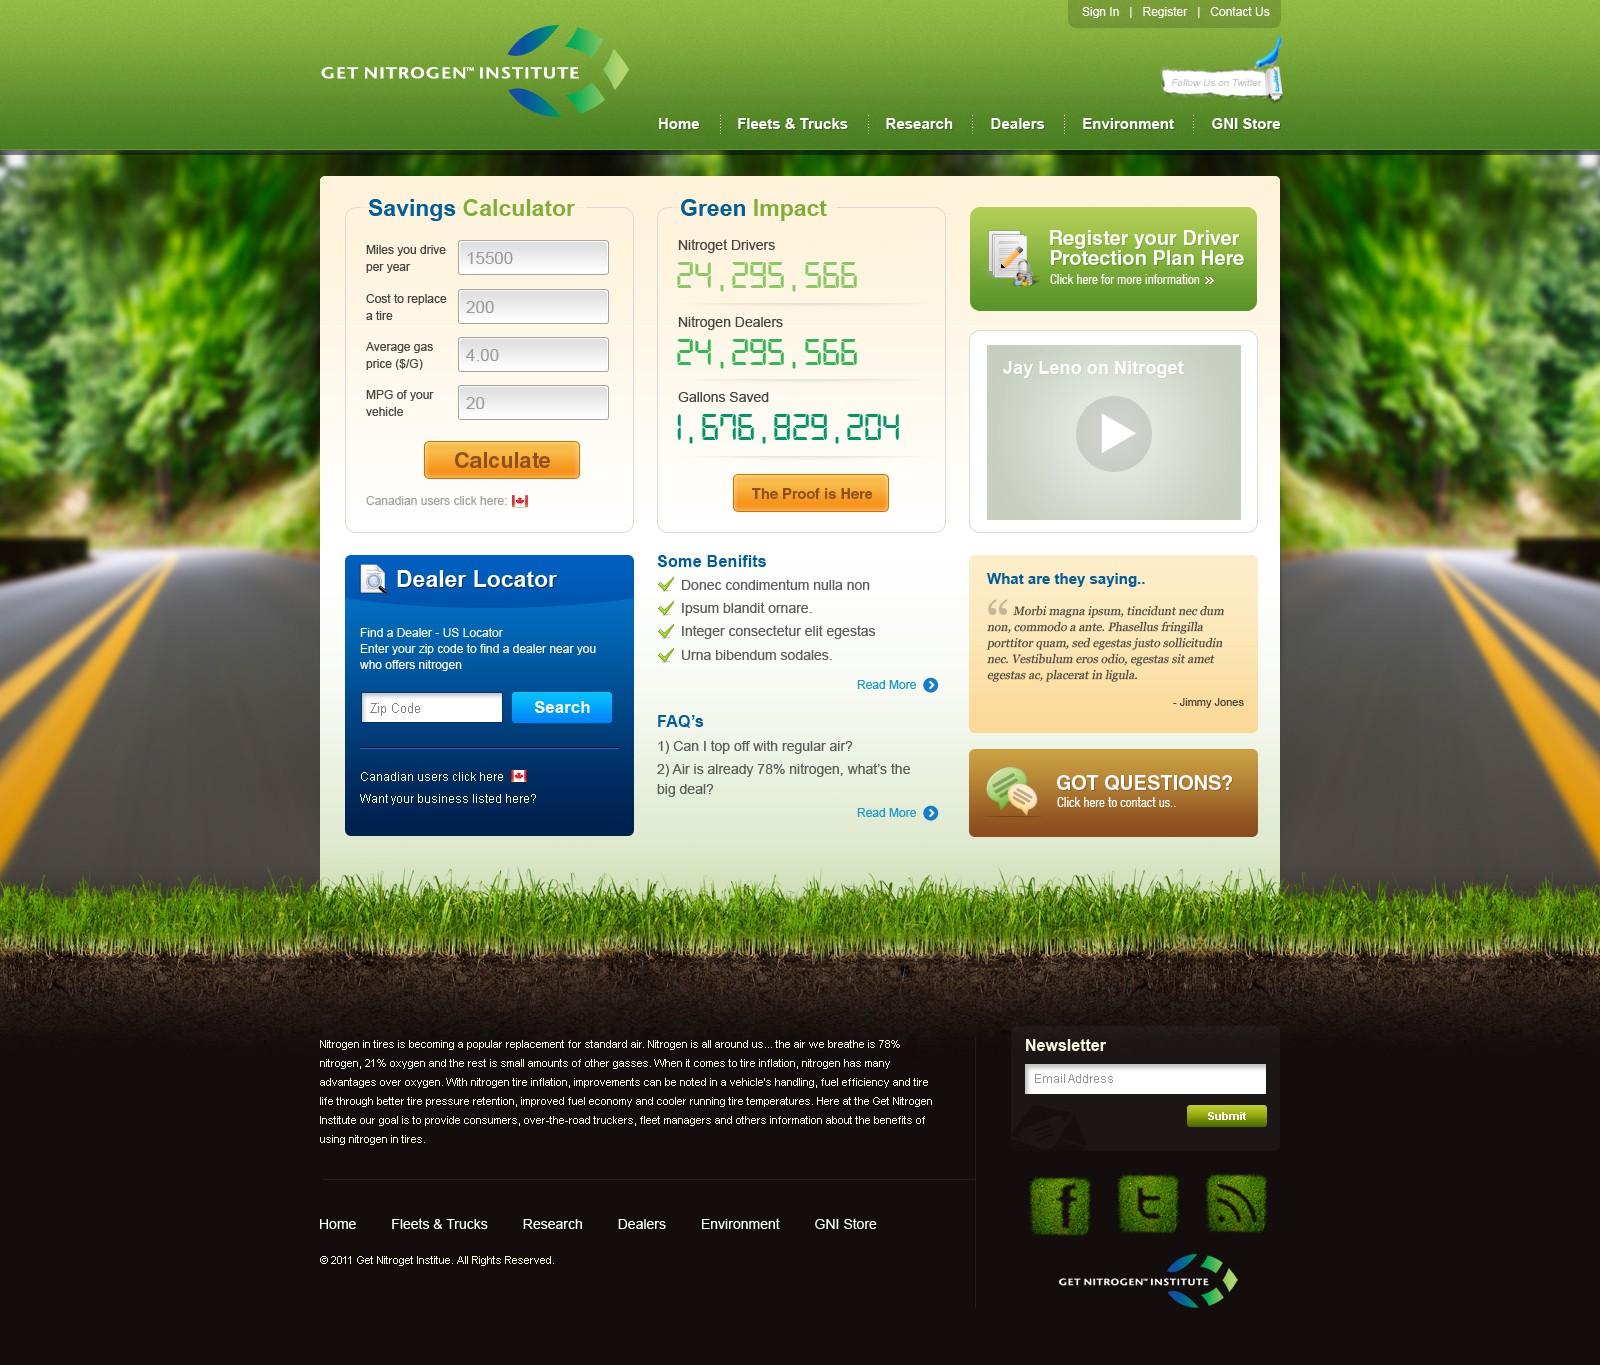 Get Nitrogen Institute needs a new website design